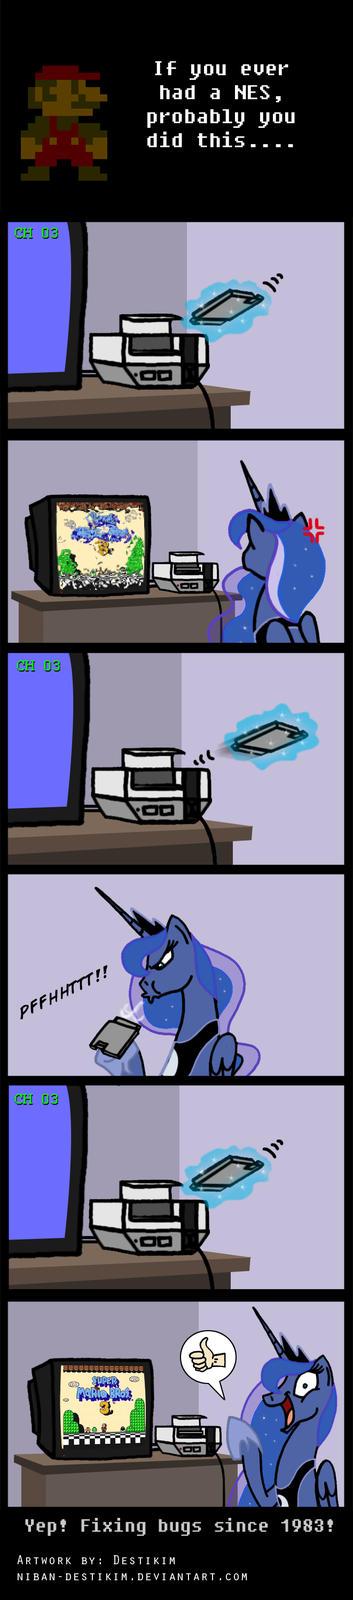 8-bit Gamer Luna - Blow it